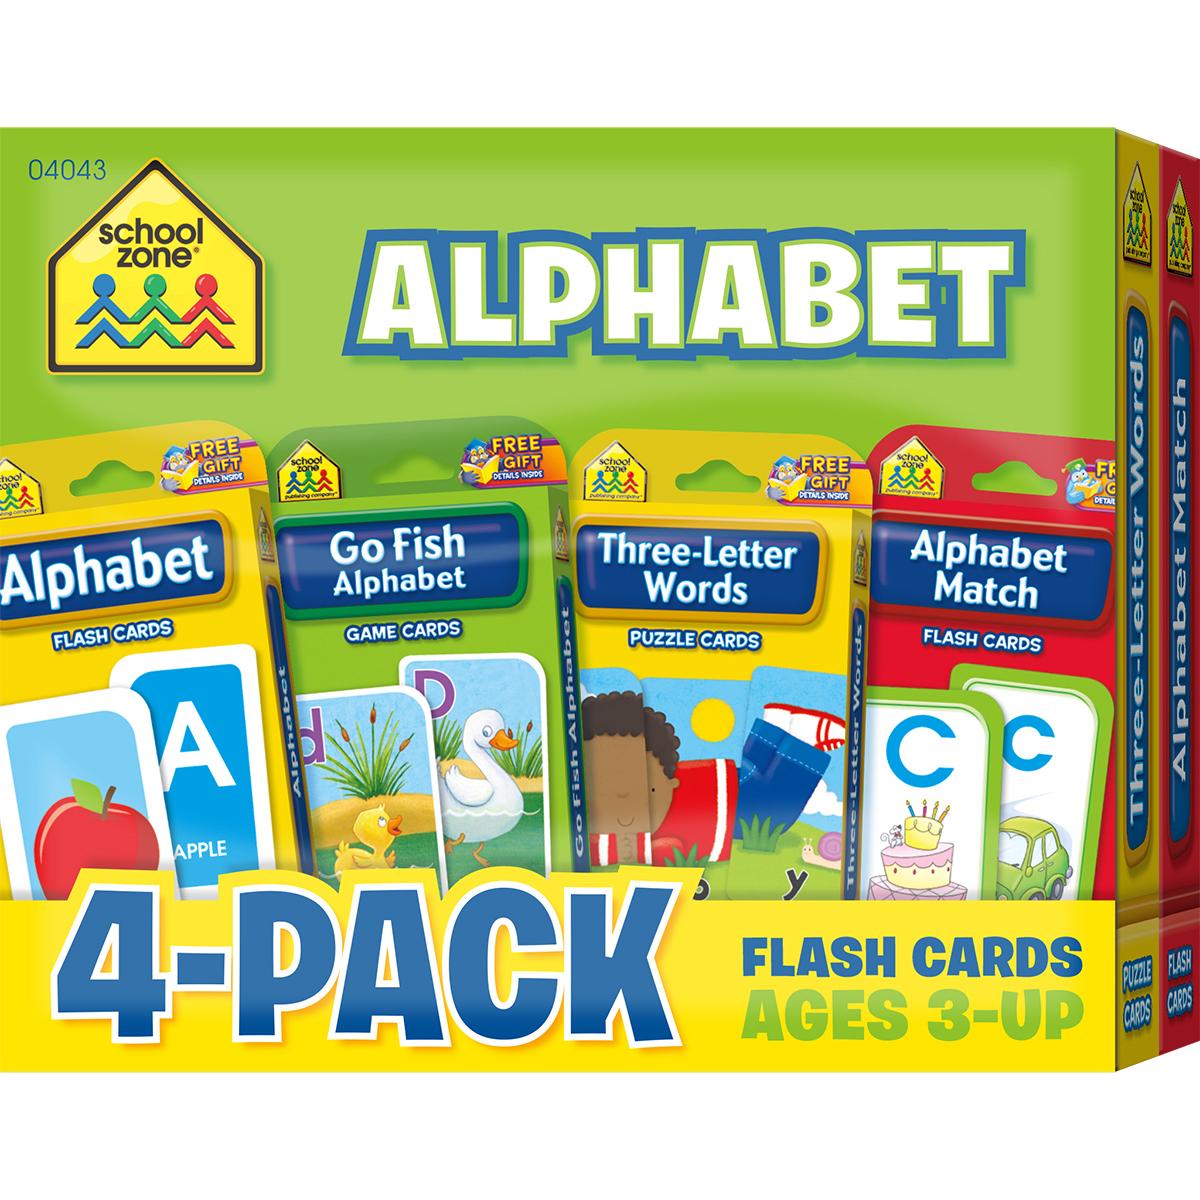 Flash Cards 4-Pack-Alphabet | Walmart Canada